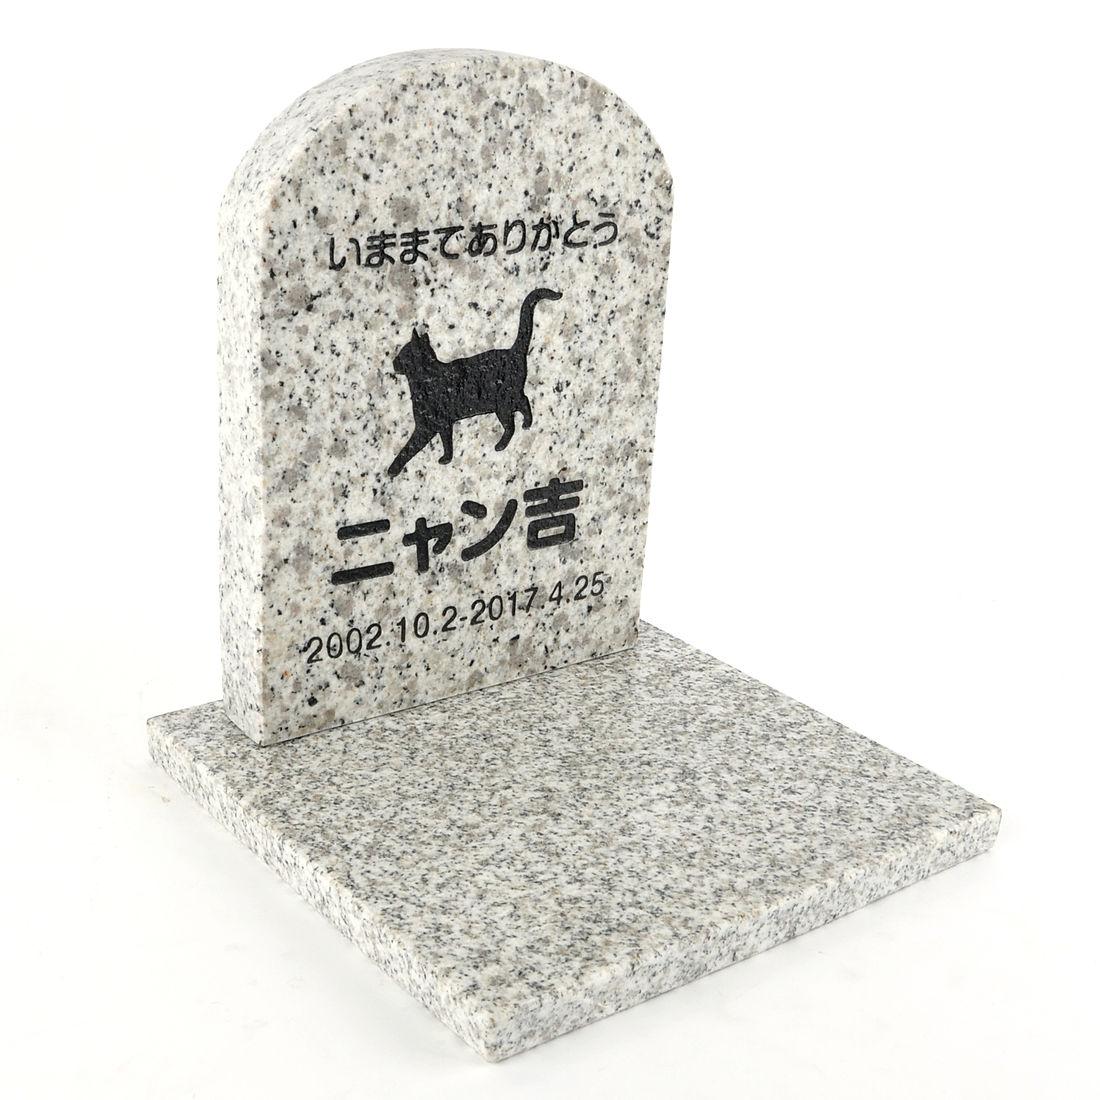 Pet&Love. ペットのお墓 天然石製 セット型 御影石 グレー スタンダード  【HLS_DU】【楽ギフ_名入れ】 attr131attr ctgr2ctgr sml3sml+ctgr2ctgr CAT